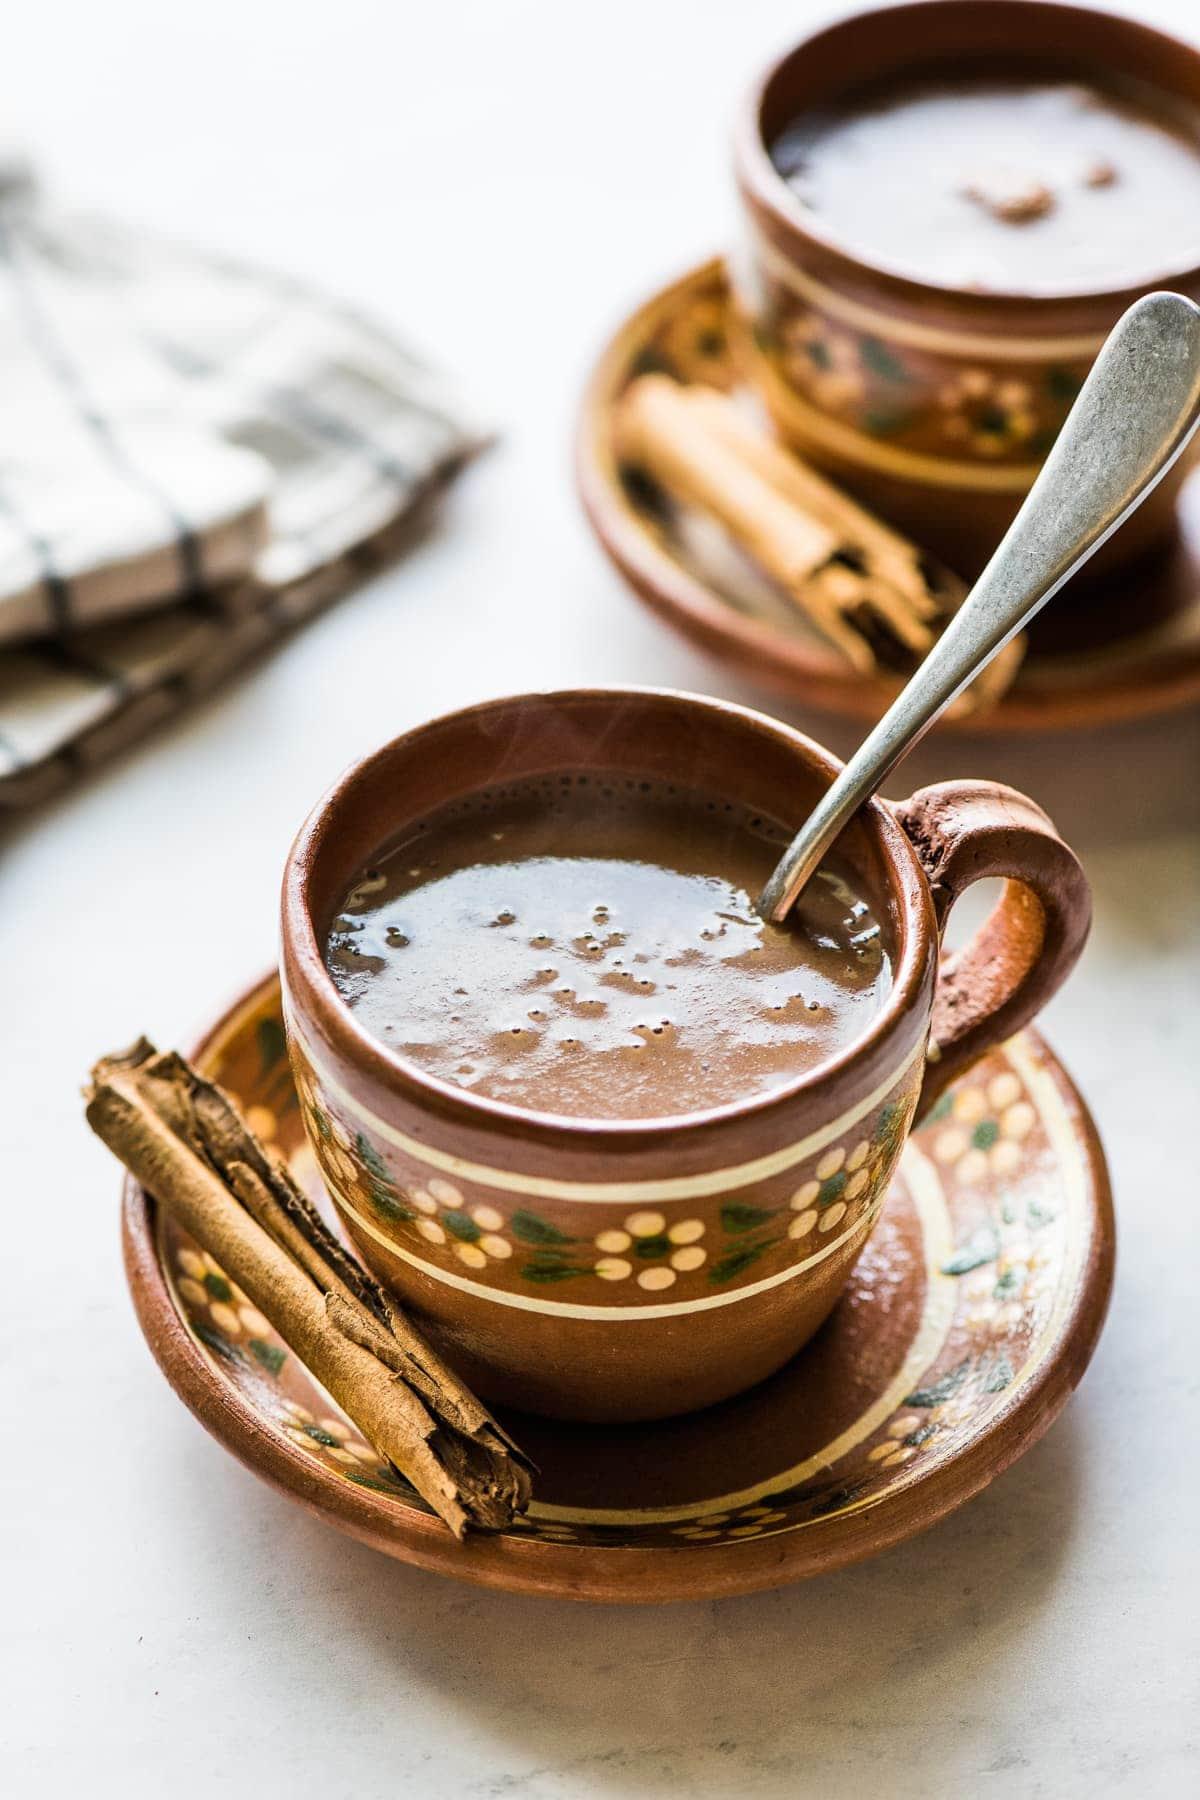 A mug of Mexican champurrado with a cinnamon stick.